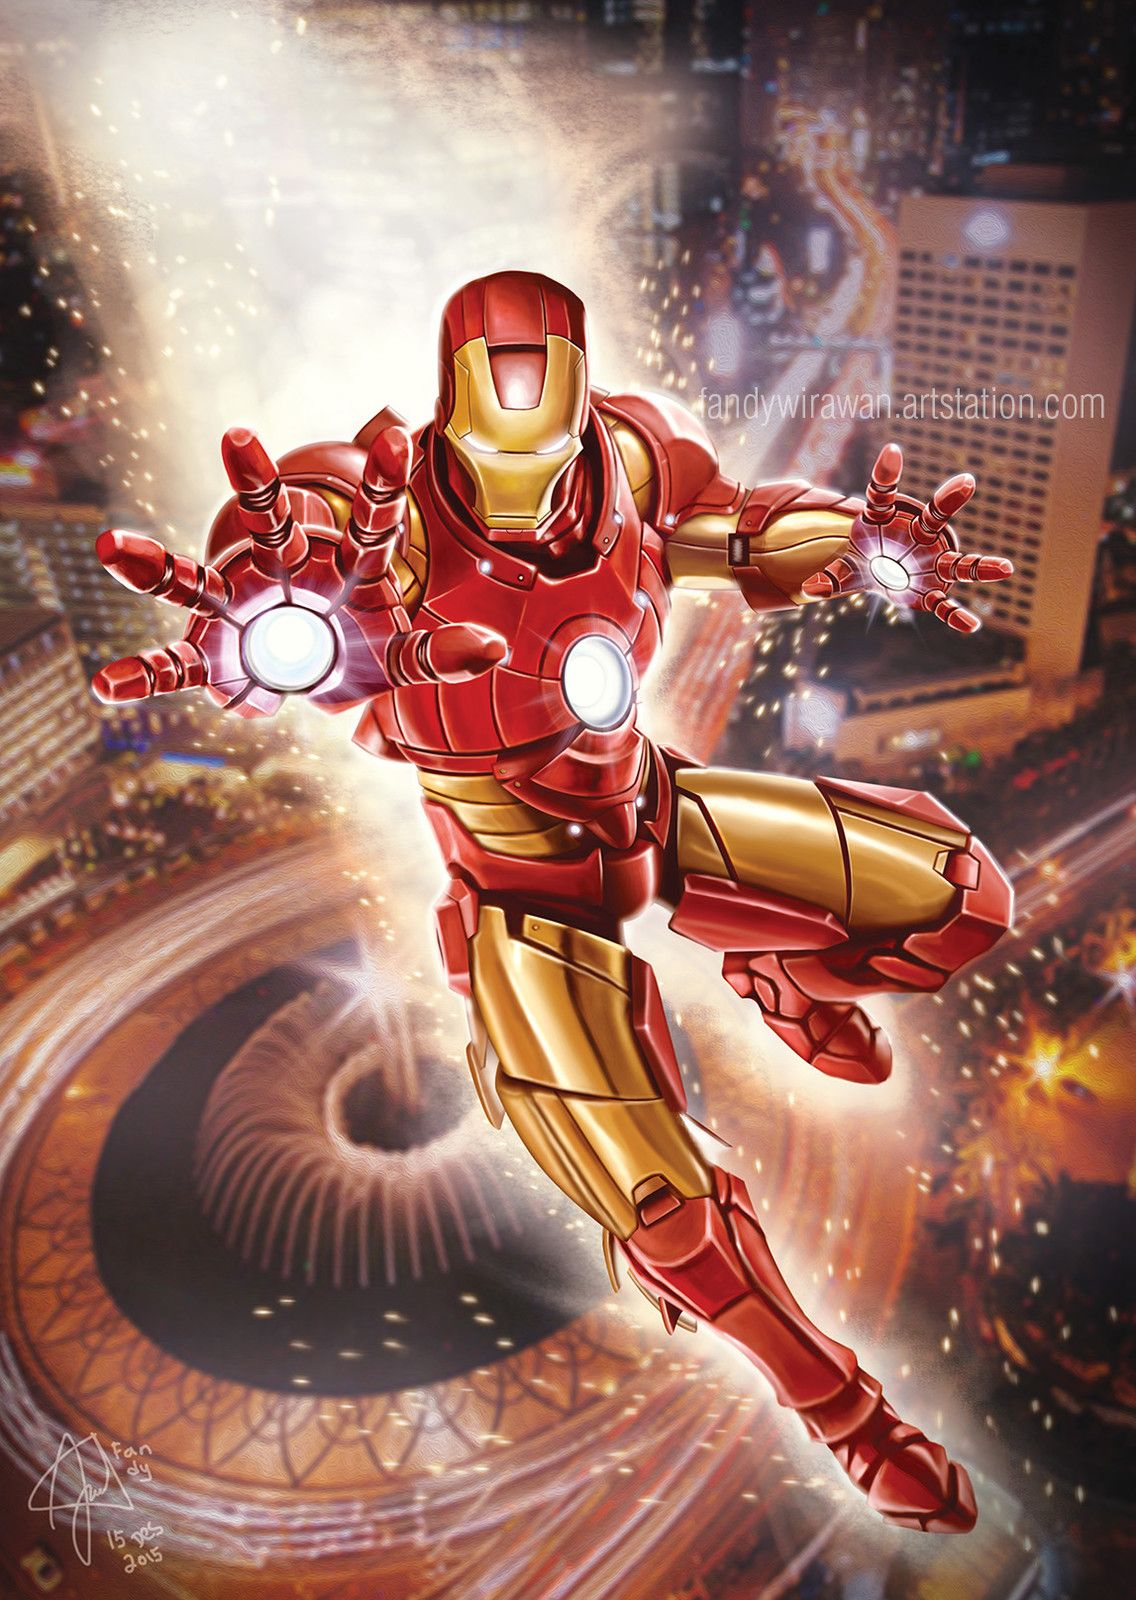 iron man fanart fandy wirawan  iron man wallpaper iron